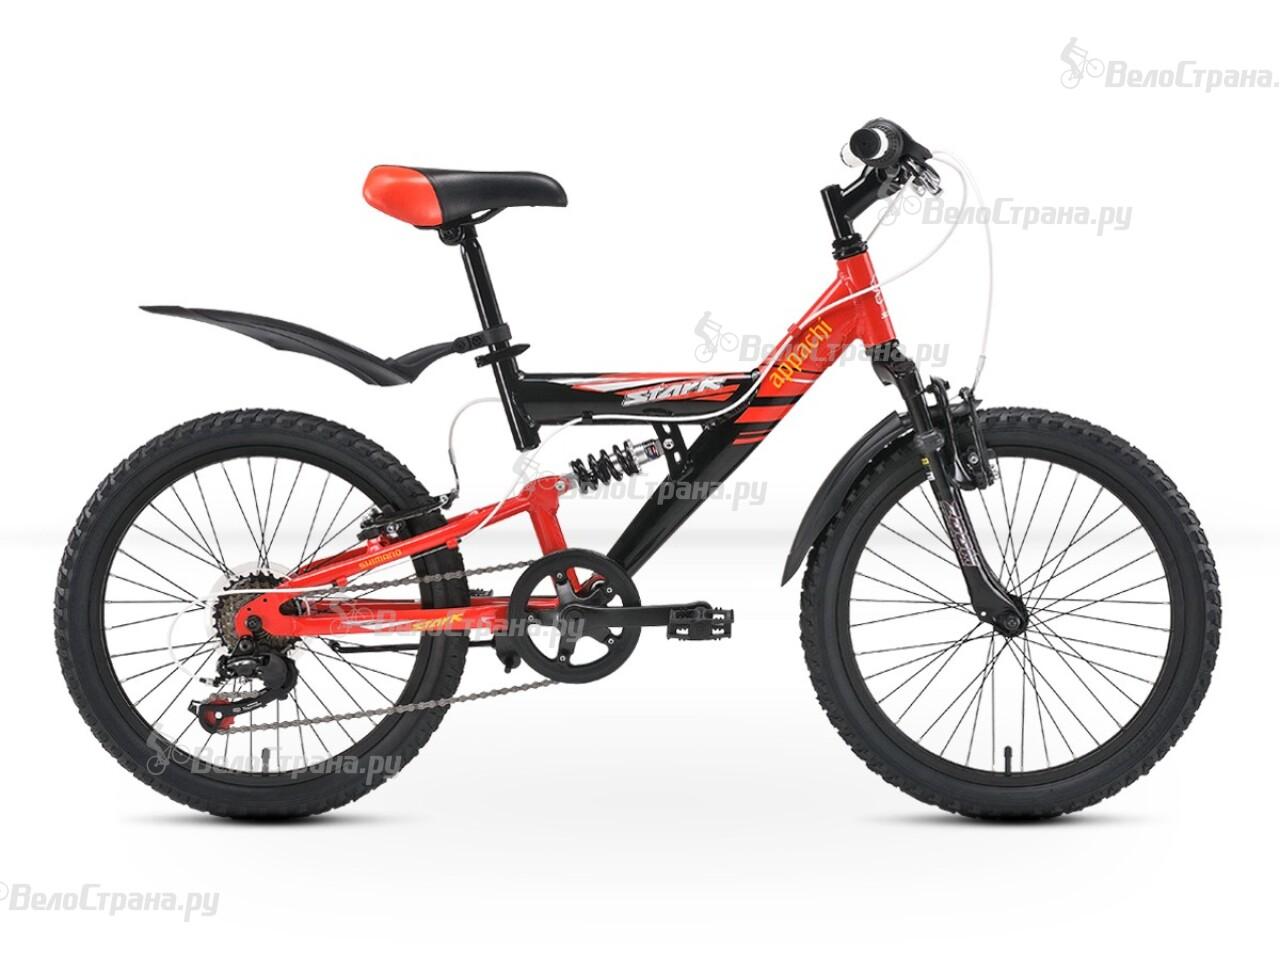 Велосипед Stark Appachi 20 (2014) vizant winter 525мм 21